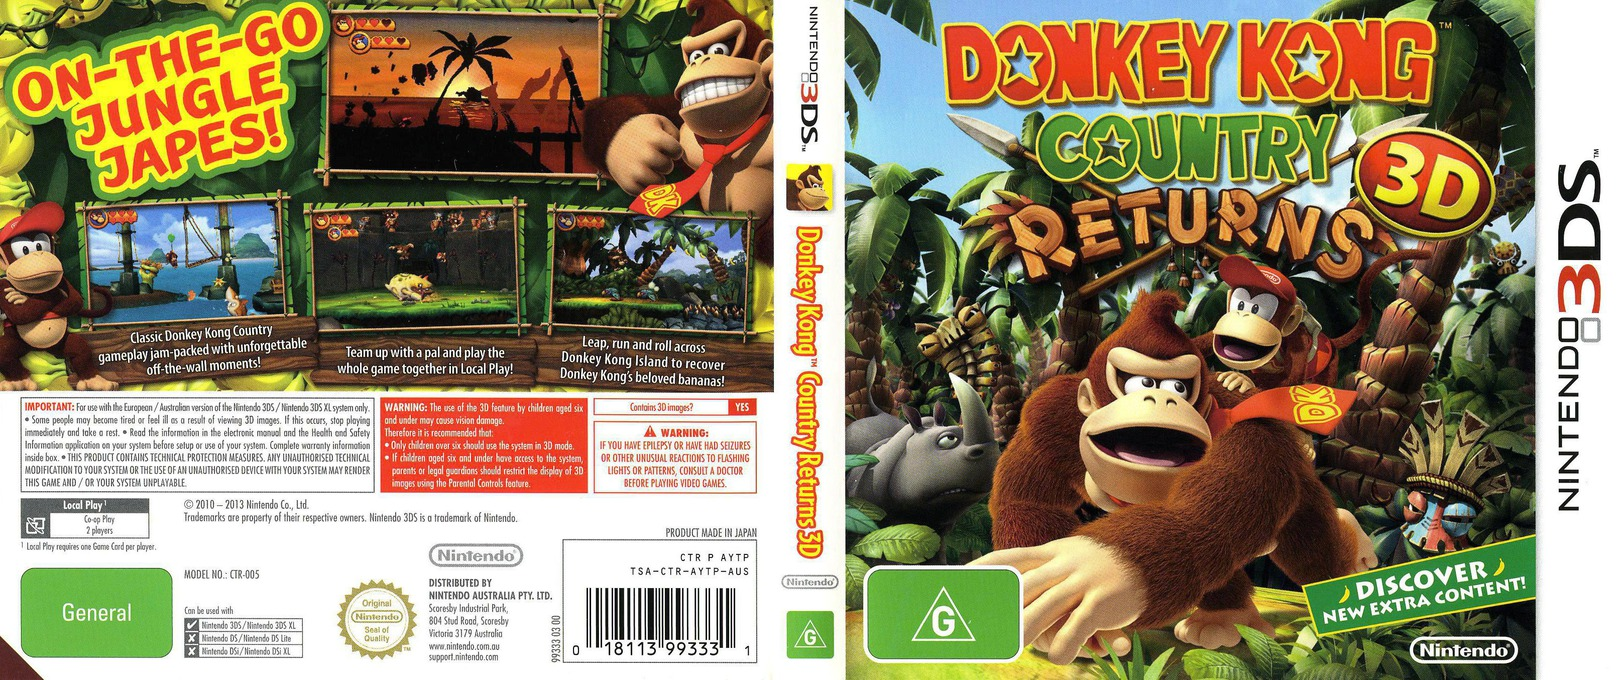 Donkey Kong Country Returns 3D 3DS coverfullHQ (AYTP)